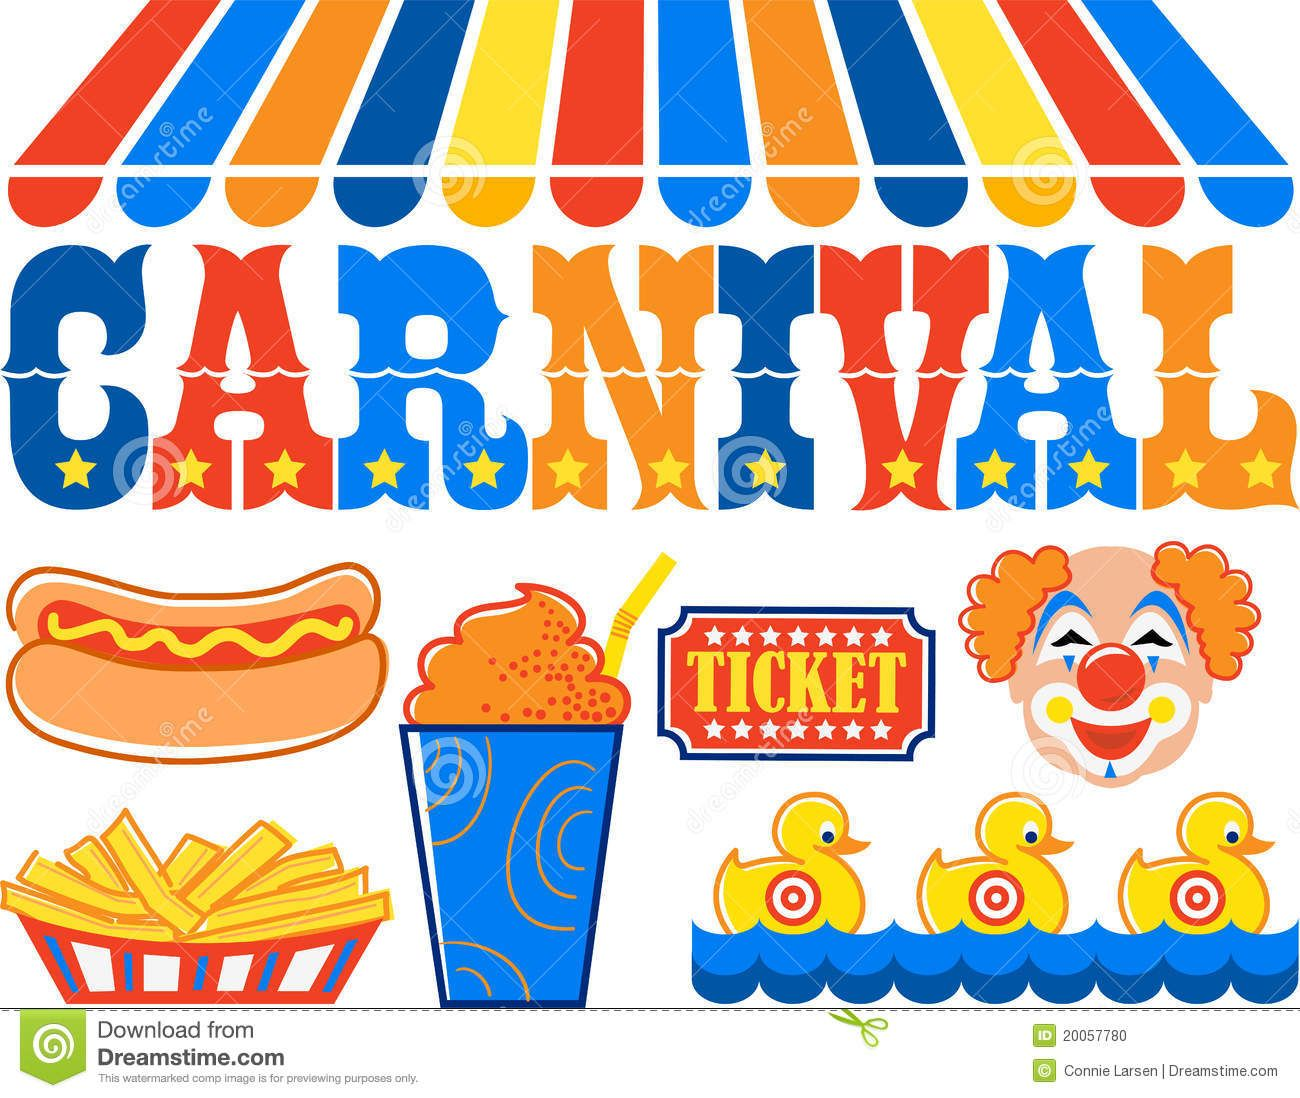 Headline Illustration Of The Word Carnival With Hot Dog Fries Slushy.